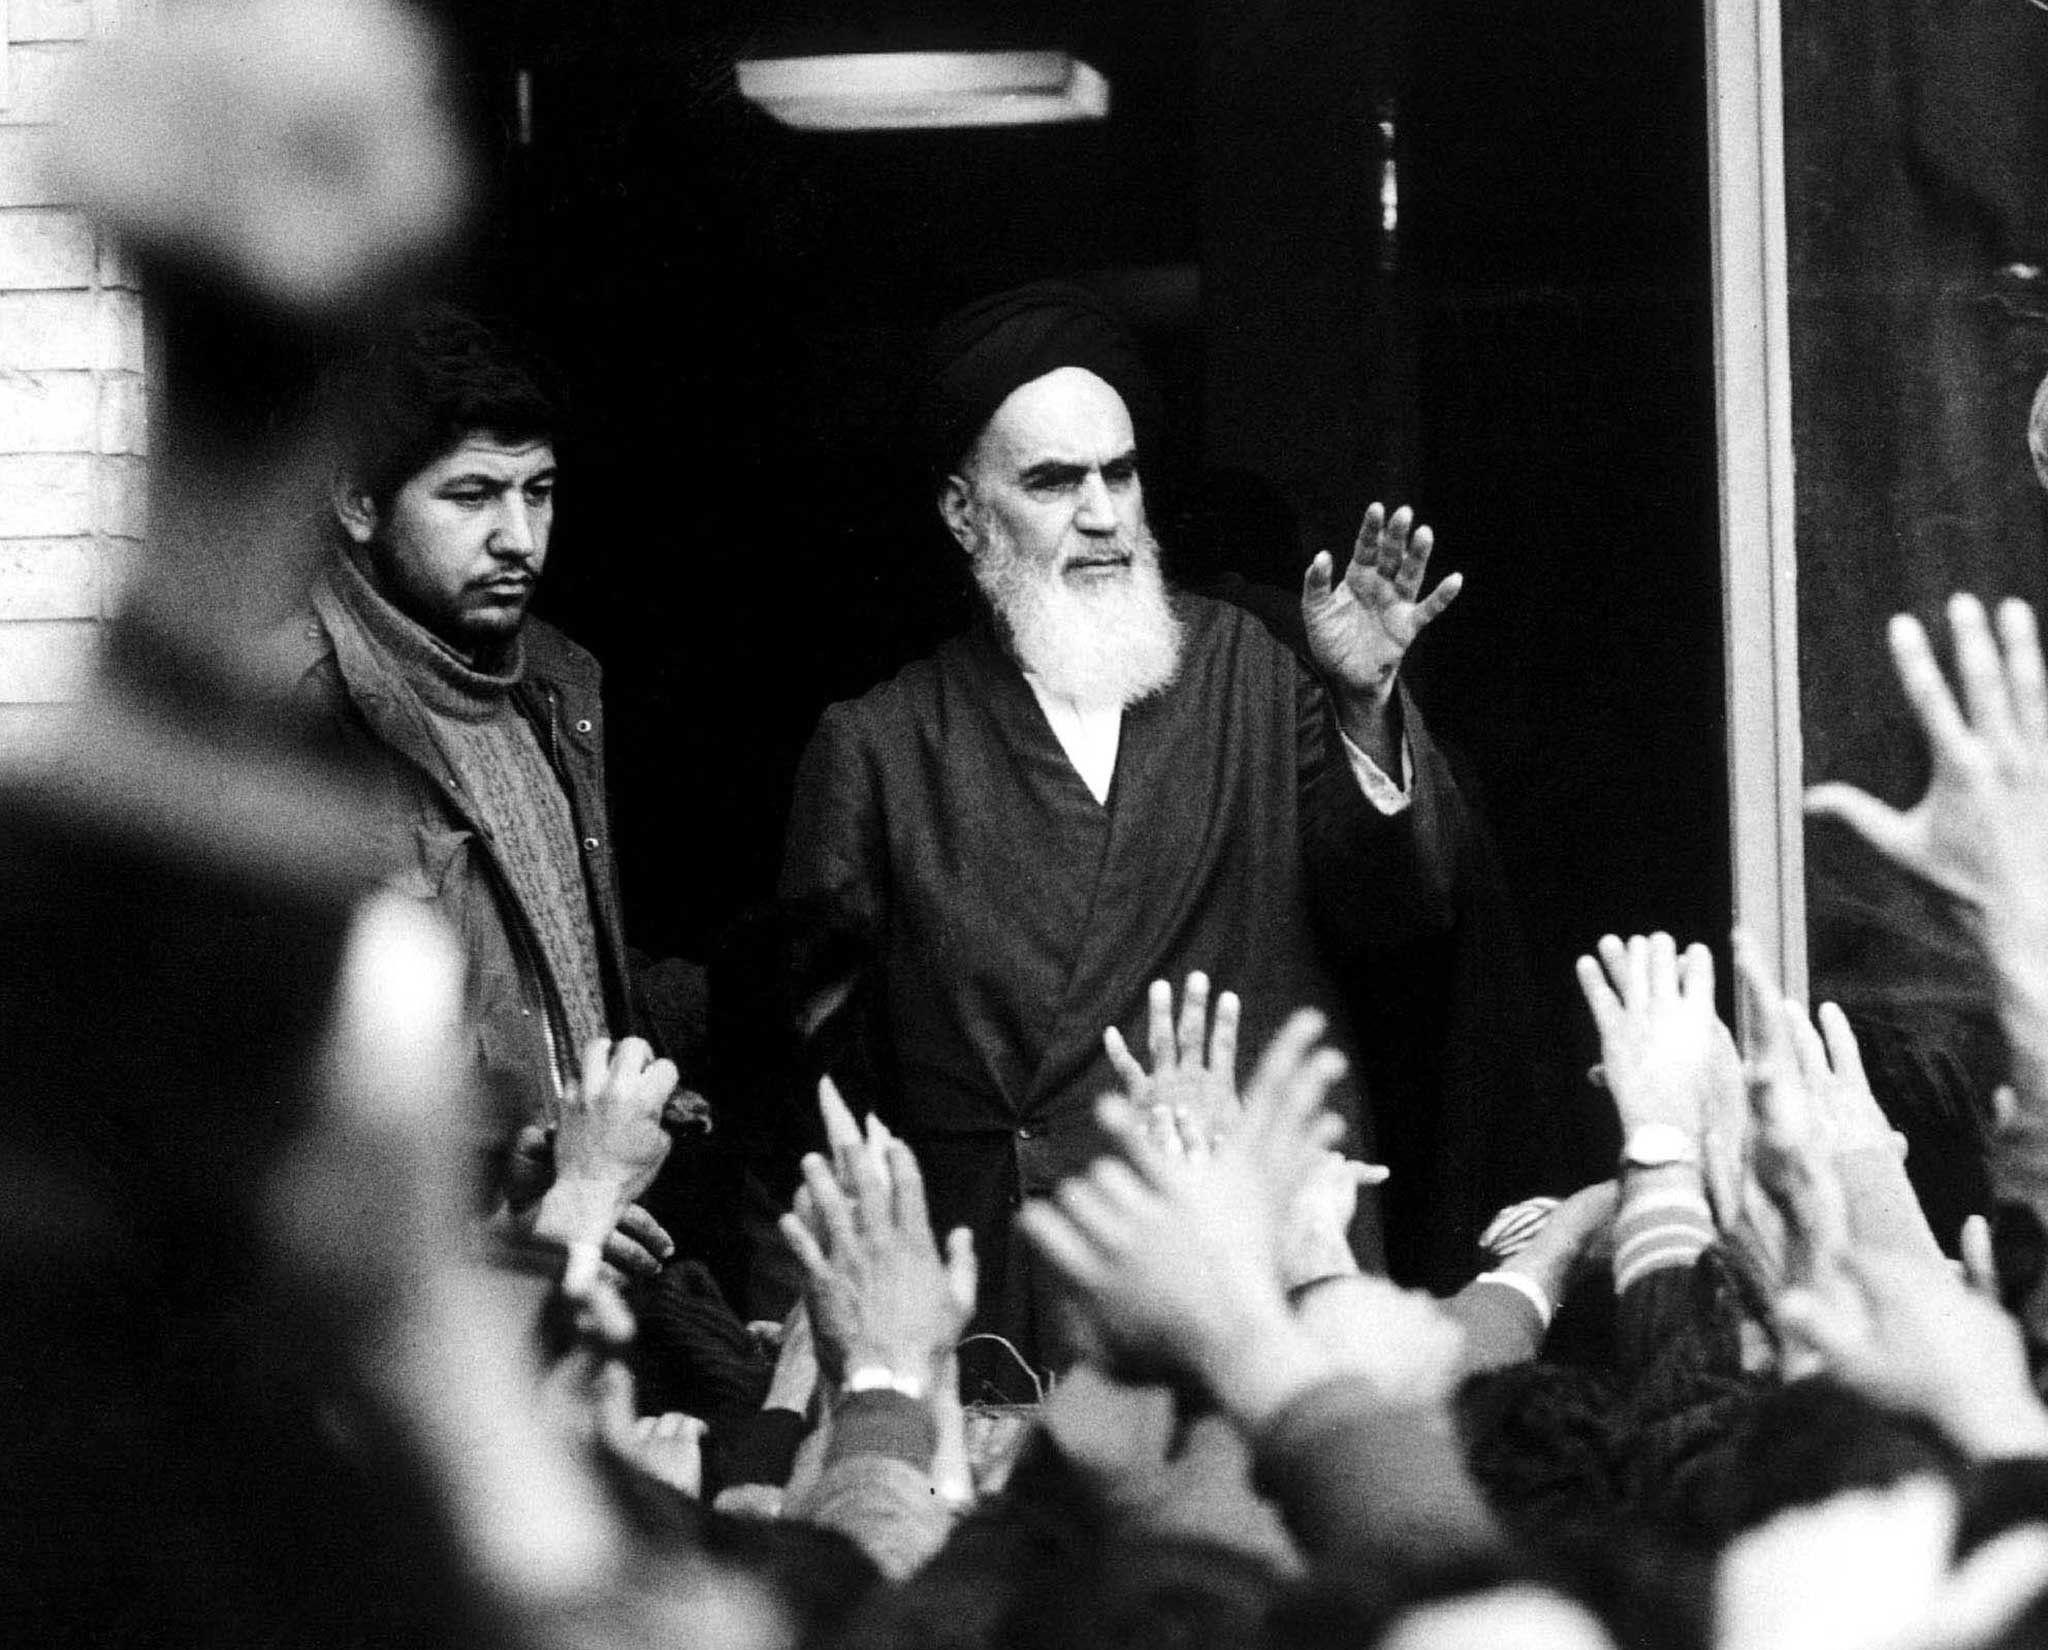 Iran: Revolutionary Contradictions